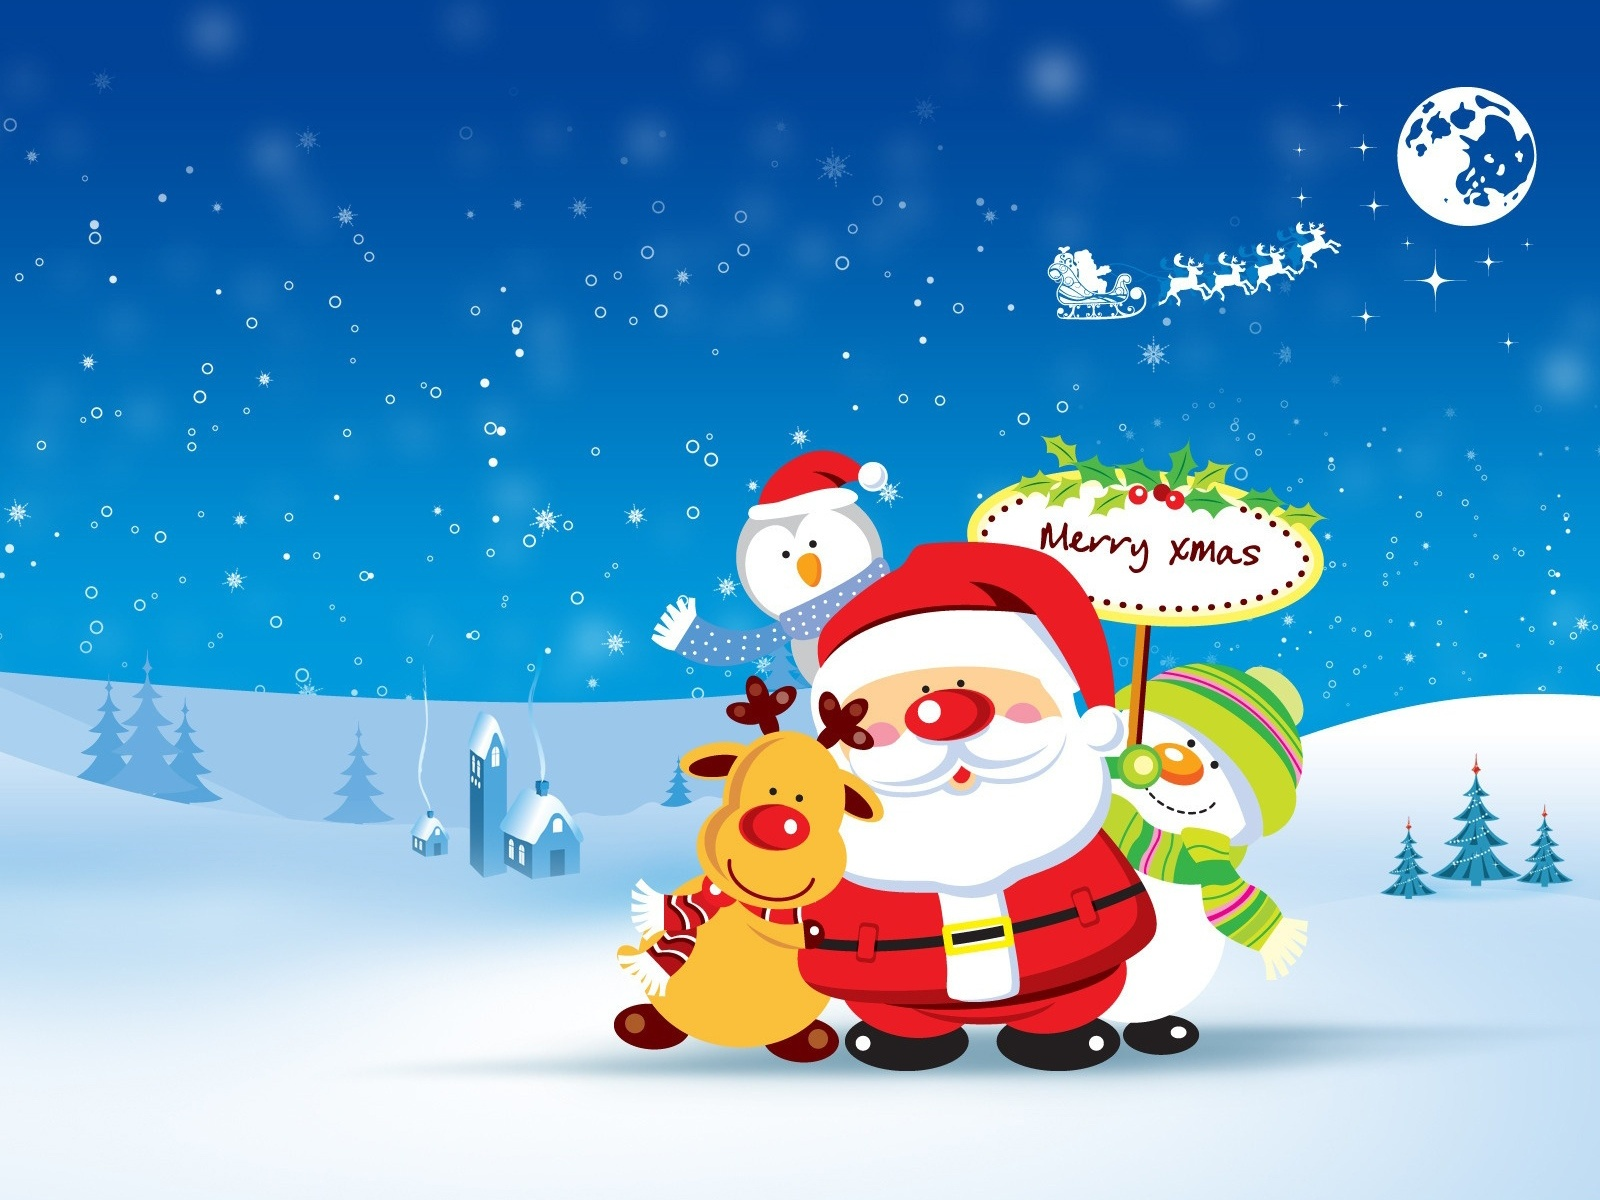 Christmas Wallpapers Christmas  Desktop Backgroundsjpg 1600x1200